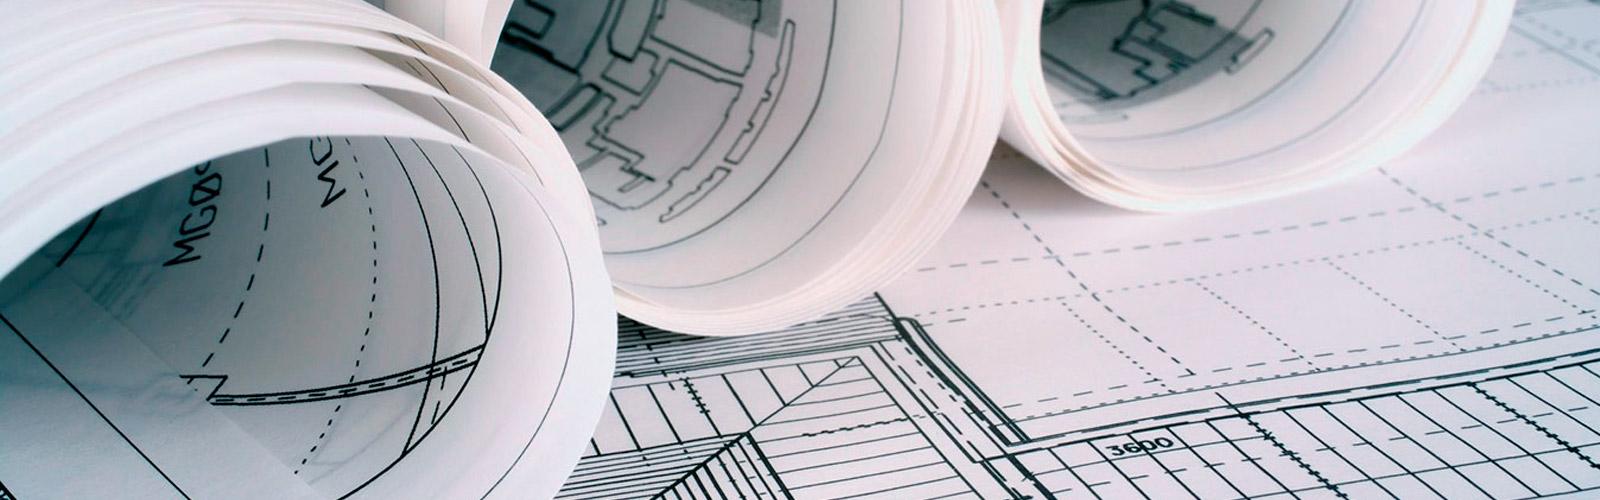 Servicios de Asesoría Técnica Inmobiliaria - DerechoInmobiliario.pe